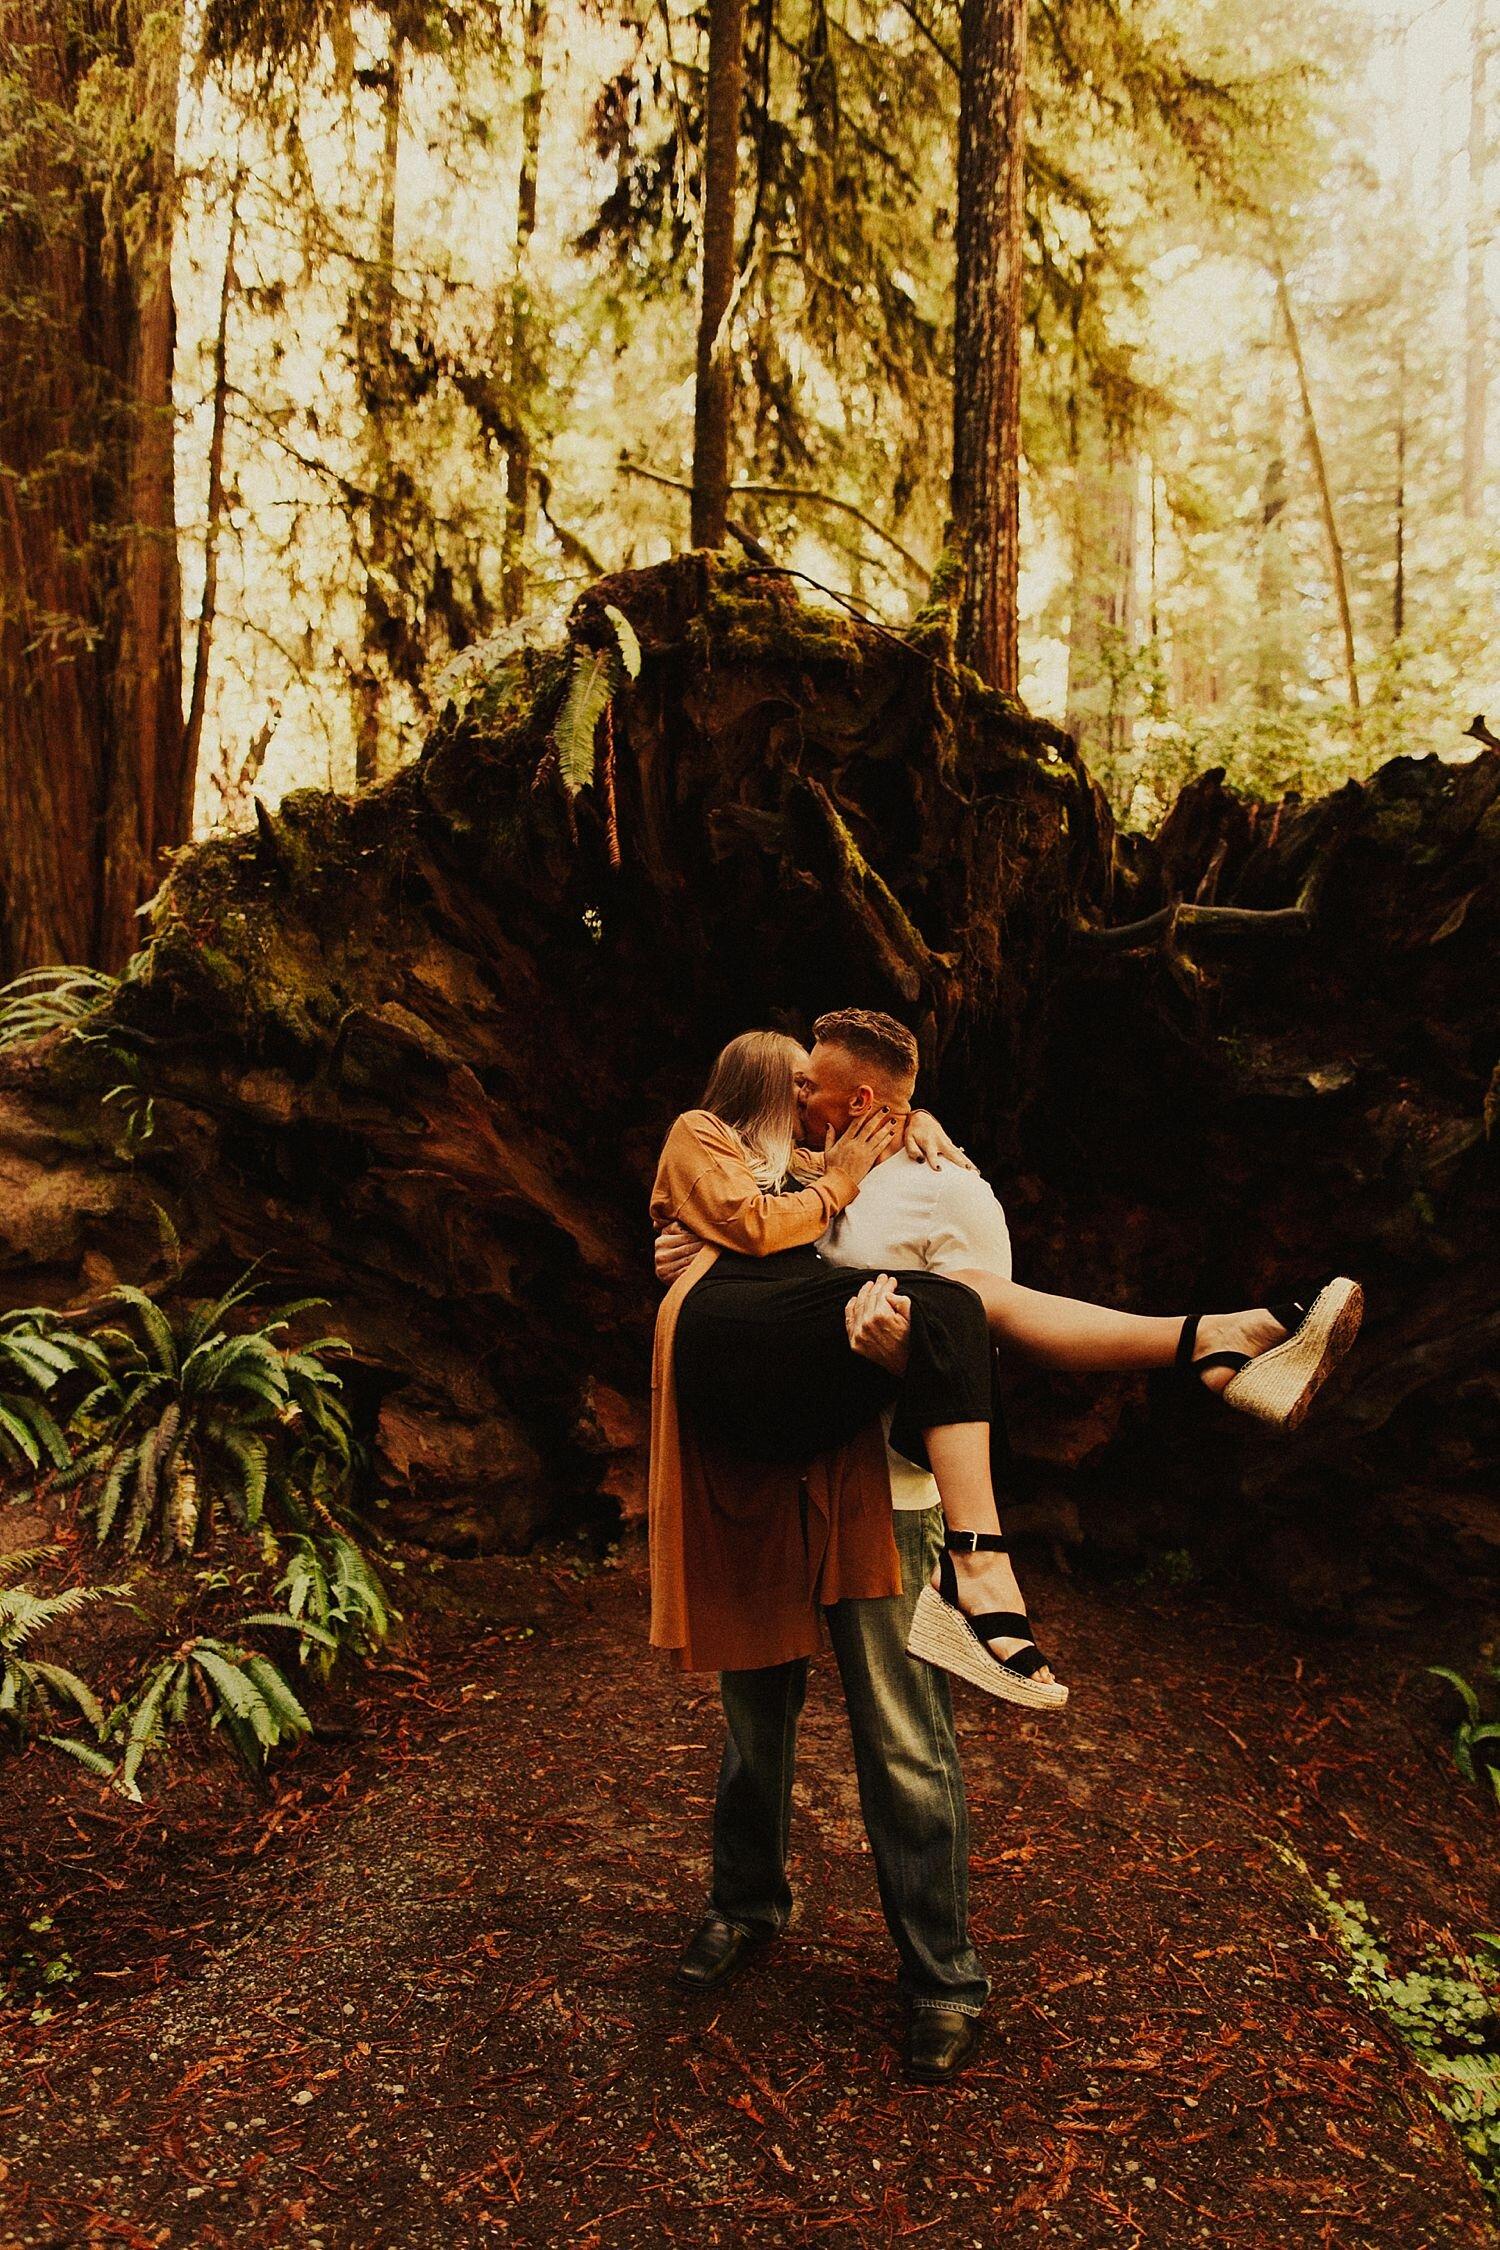 redwoods-california-maternity-photos_4304.jpg